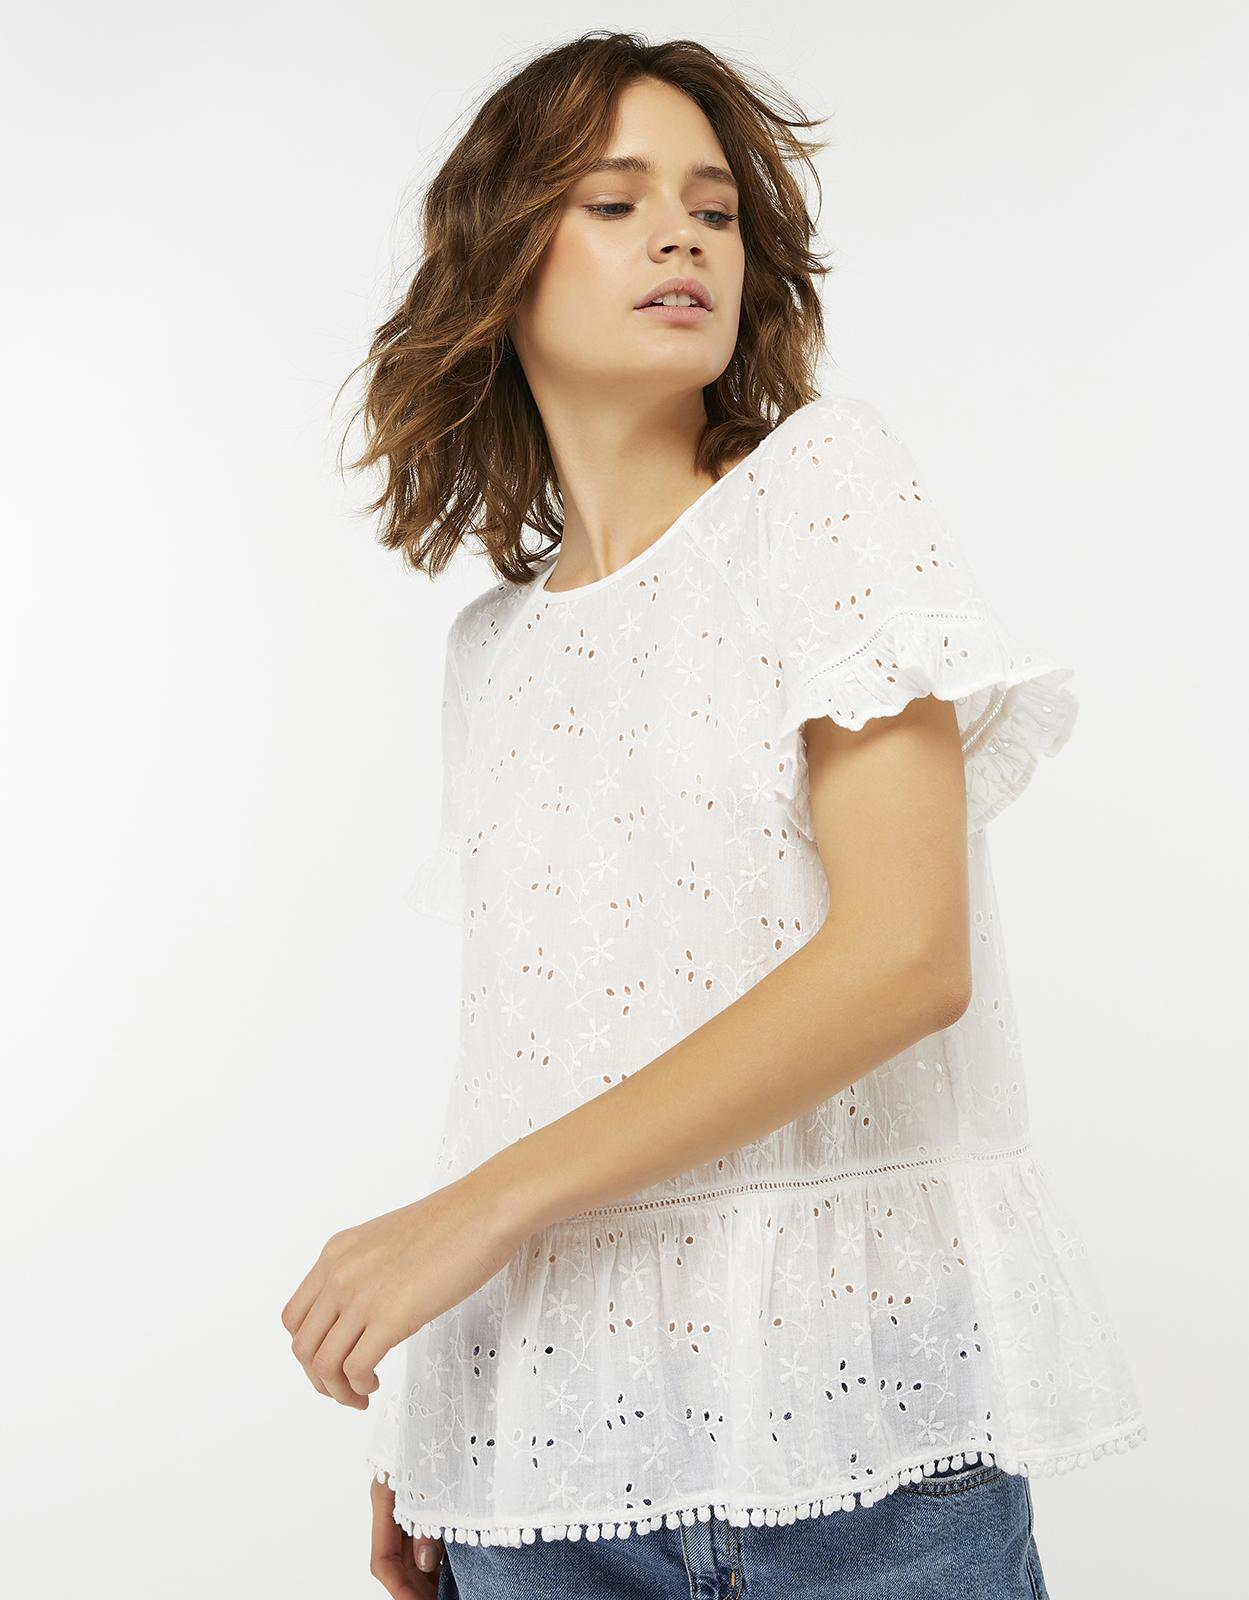 dd5b103a20 Accessorize Schiffli Cutwork Cotton Top in White - Lyst